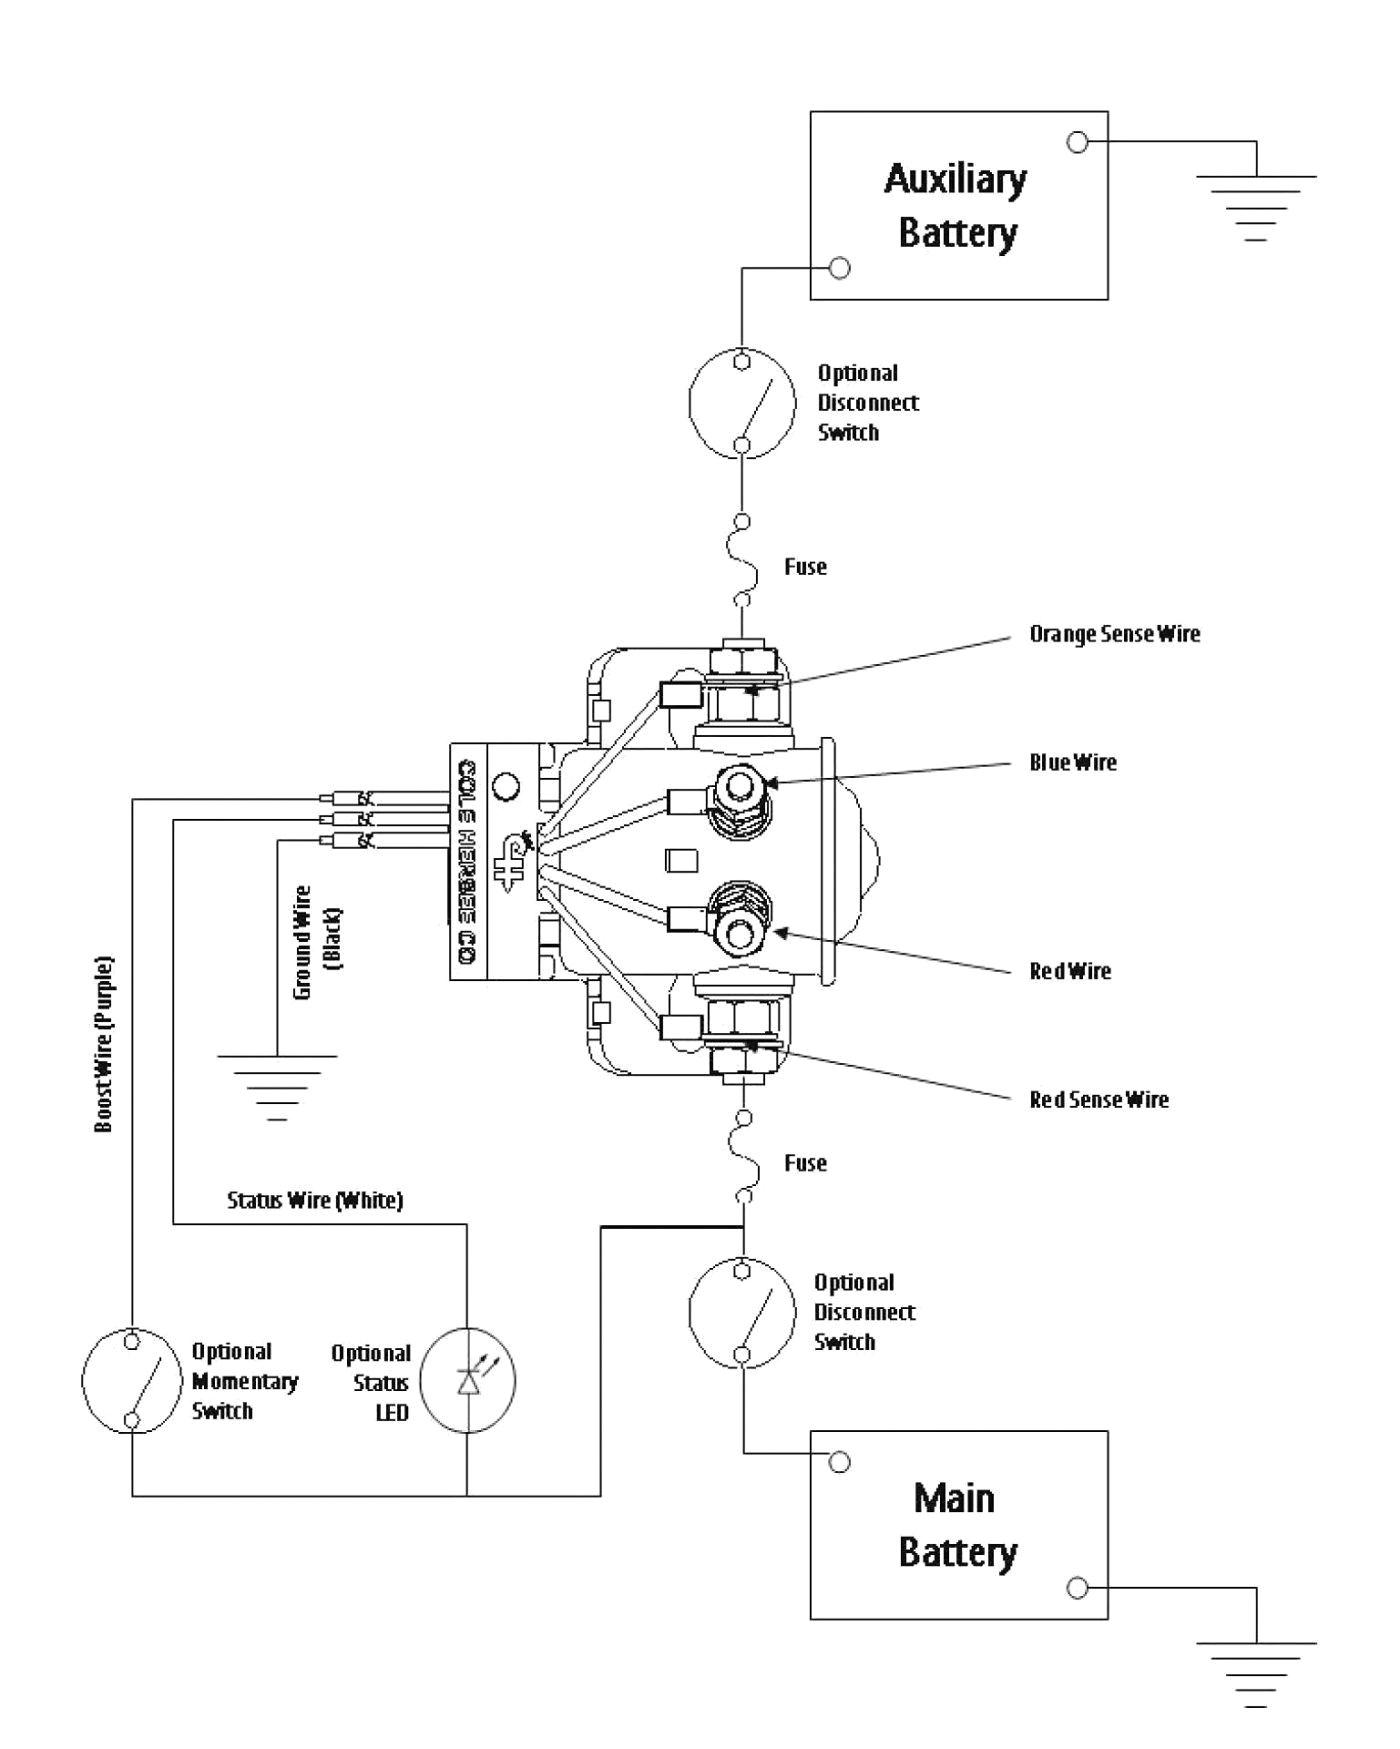 12 volt dual battery wiring diagram inspirational boat audio wiring12 volt dual battery wiring diagram unique